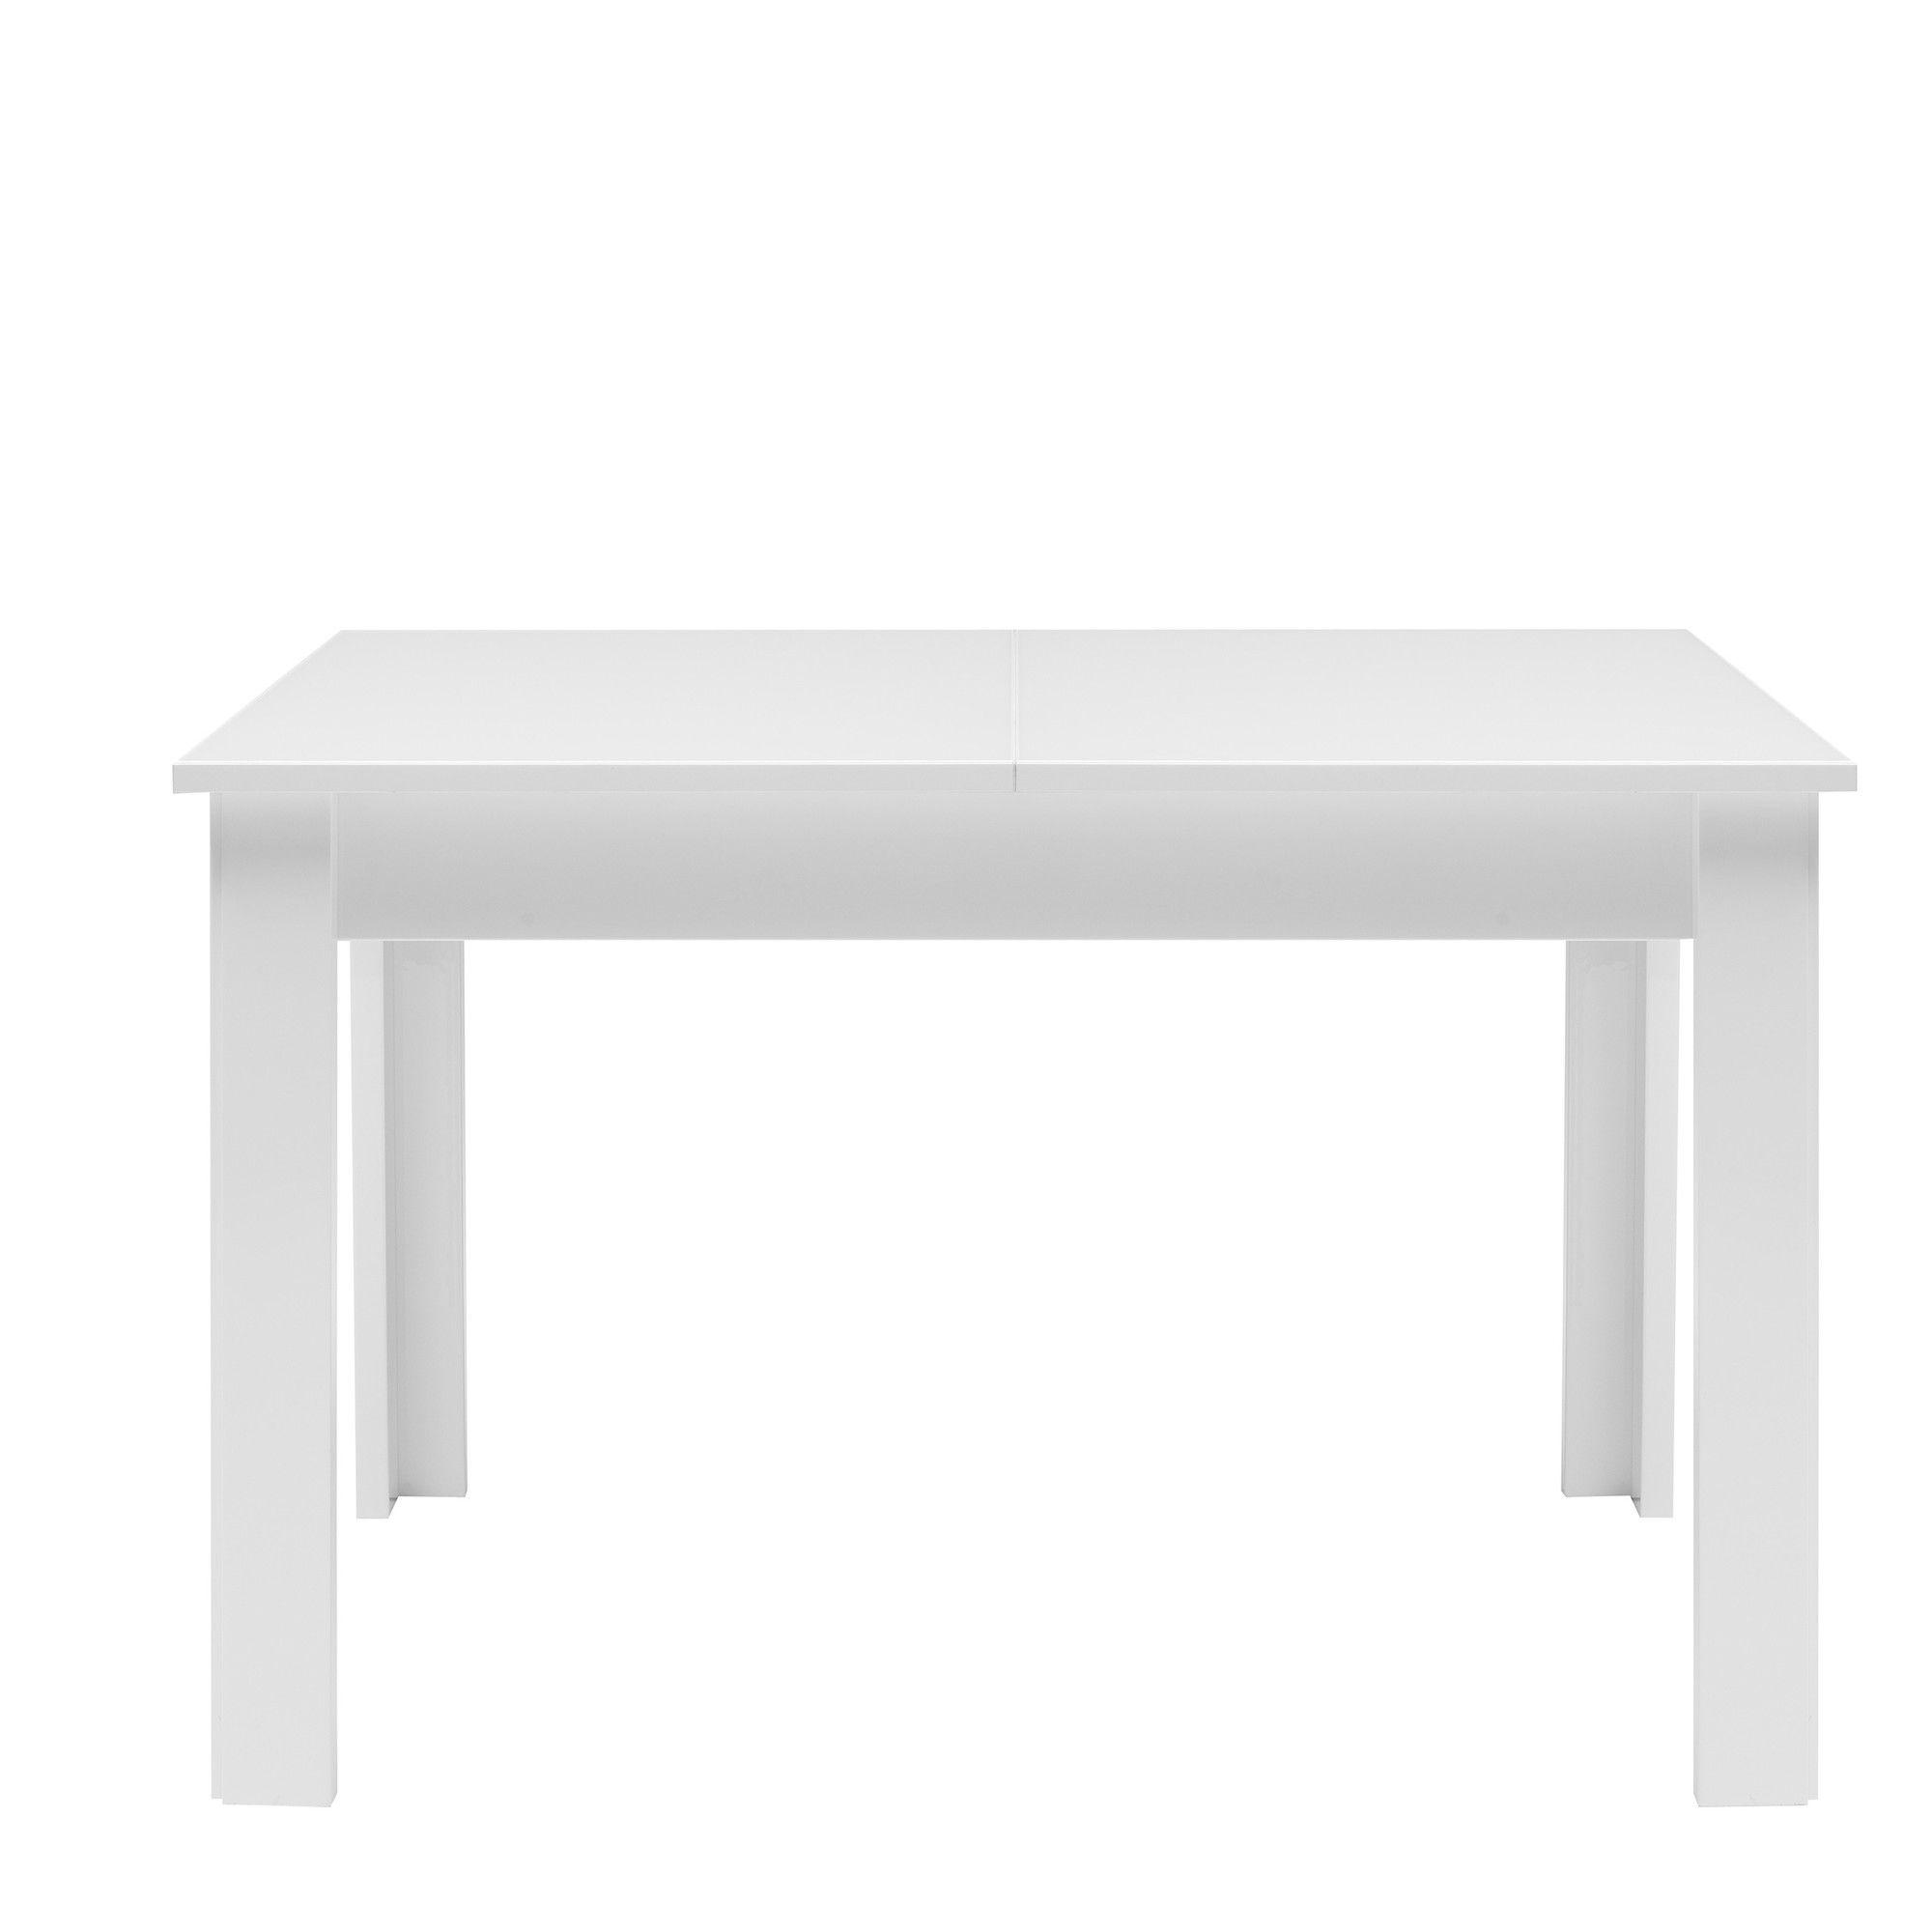 Extending Table 187 Tesco Extending Tables : 554 8529PI1000015MNwid2000amphei2000 from extendingtable.co.uk size 2000 x 2000 jpeg 50kB